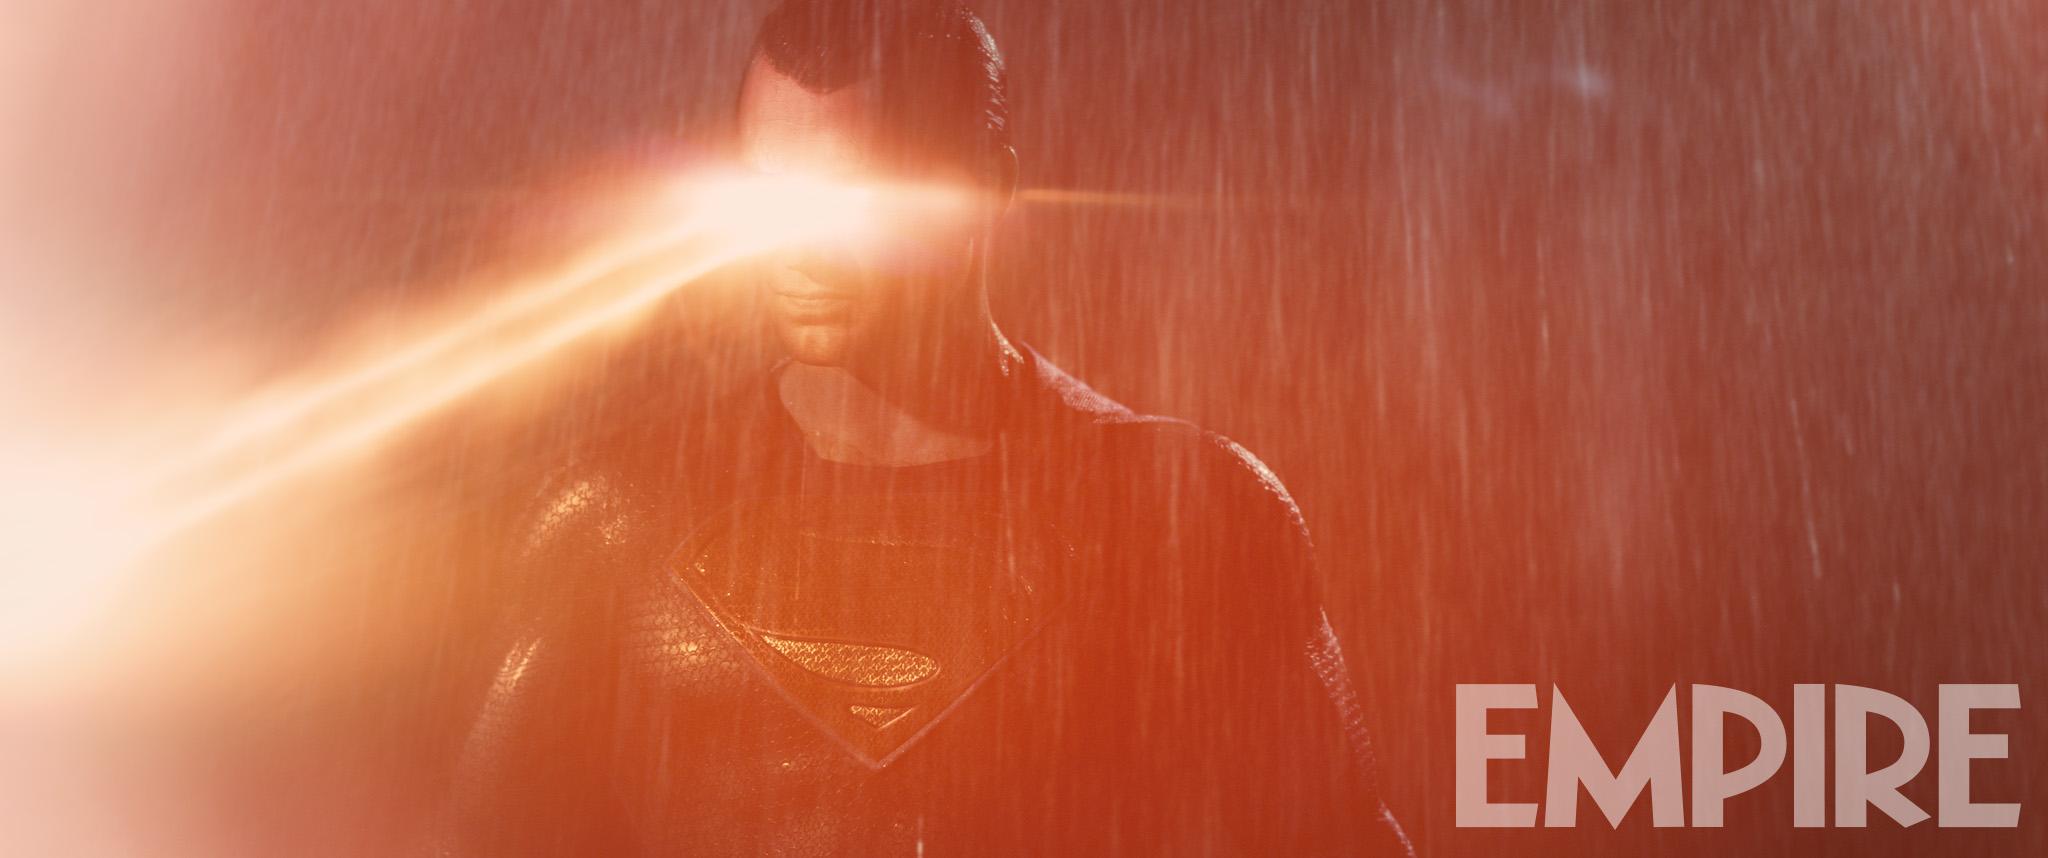 Batman v Superman: l'eroe interpretato da Henry Cavill in una foto del film